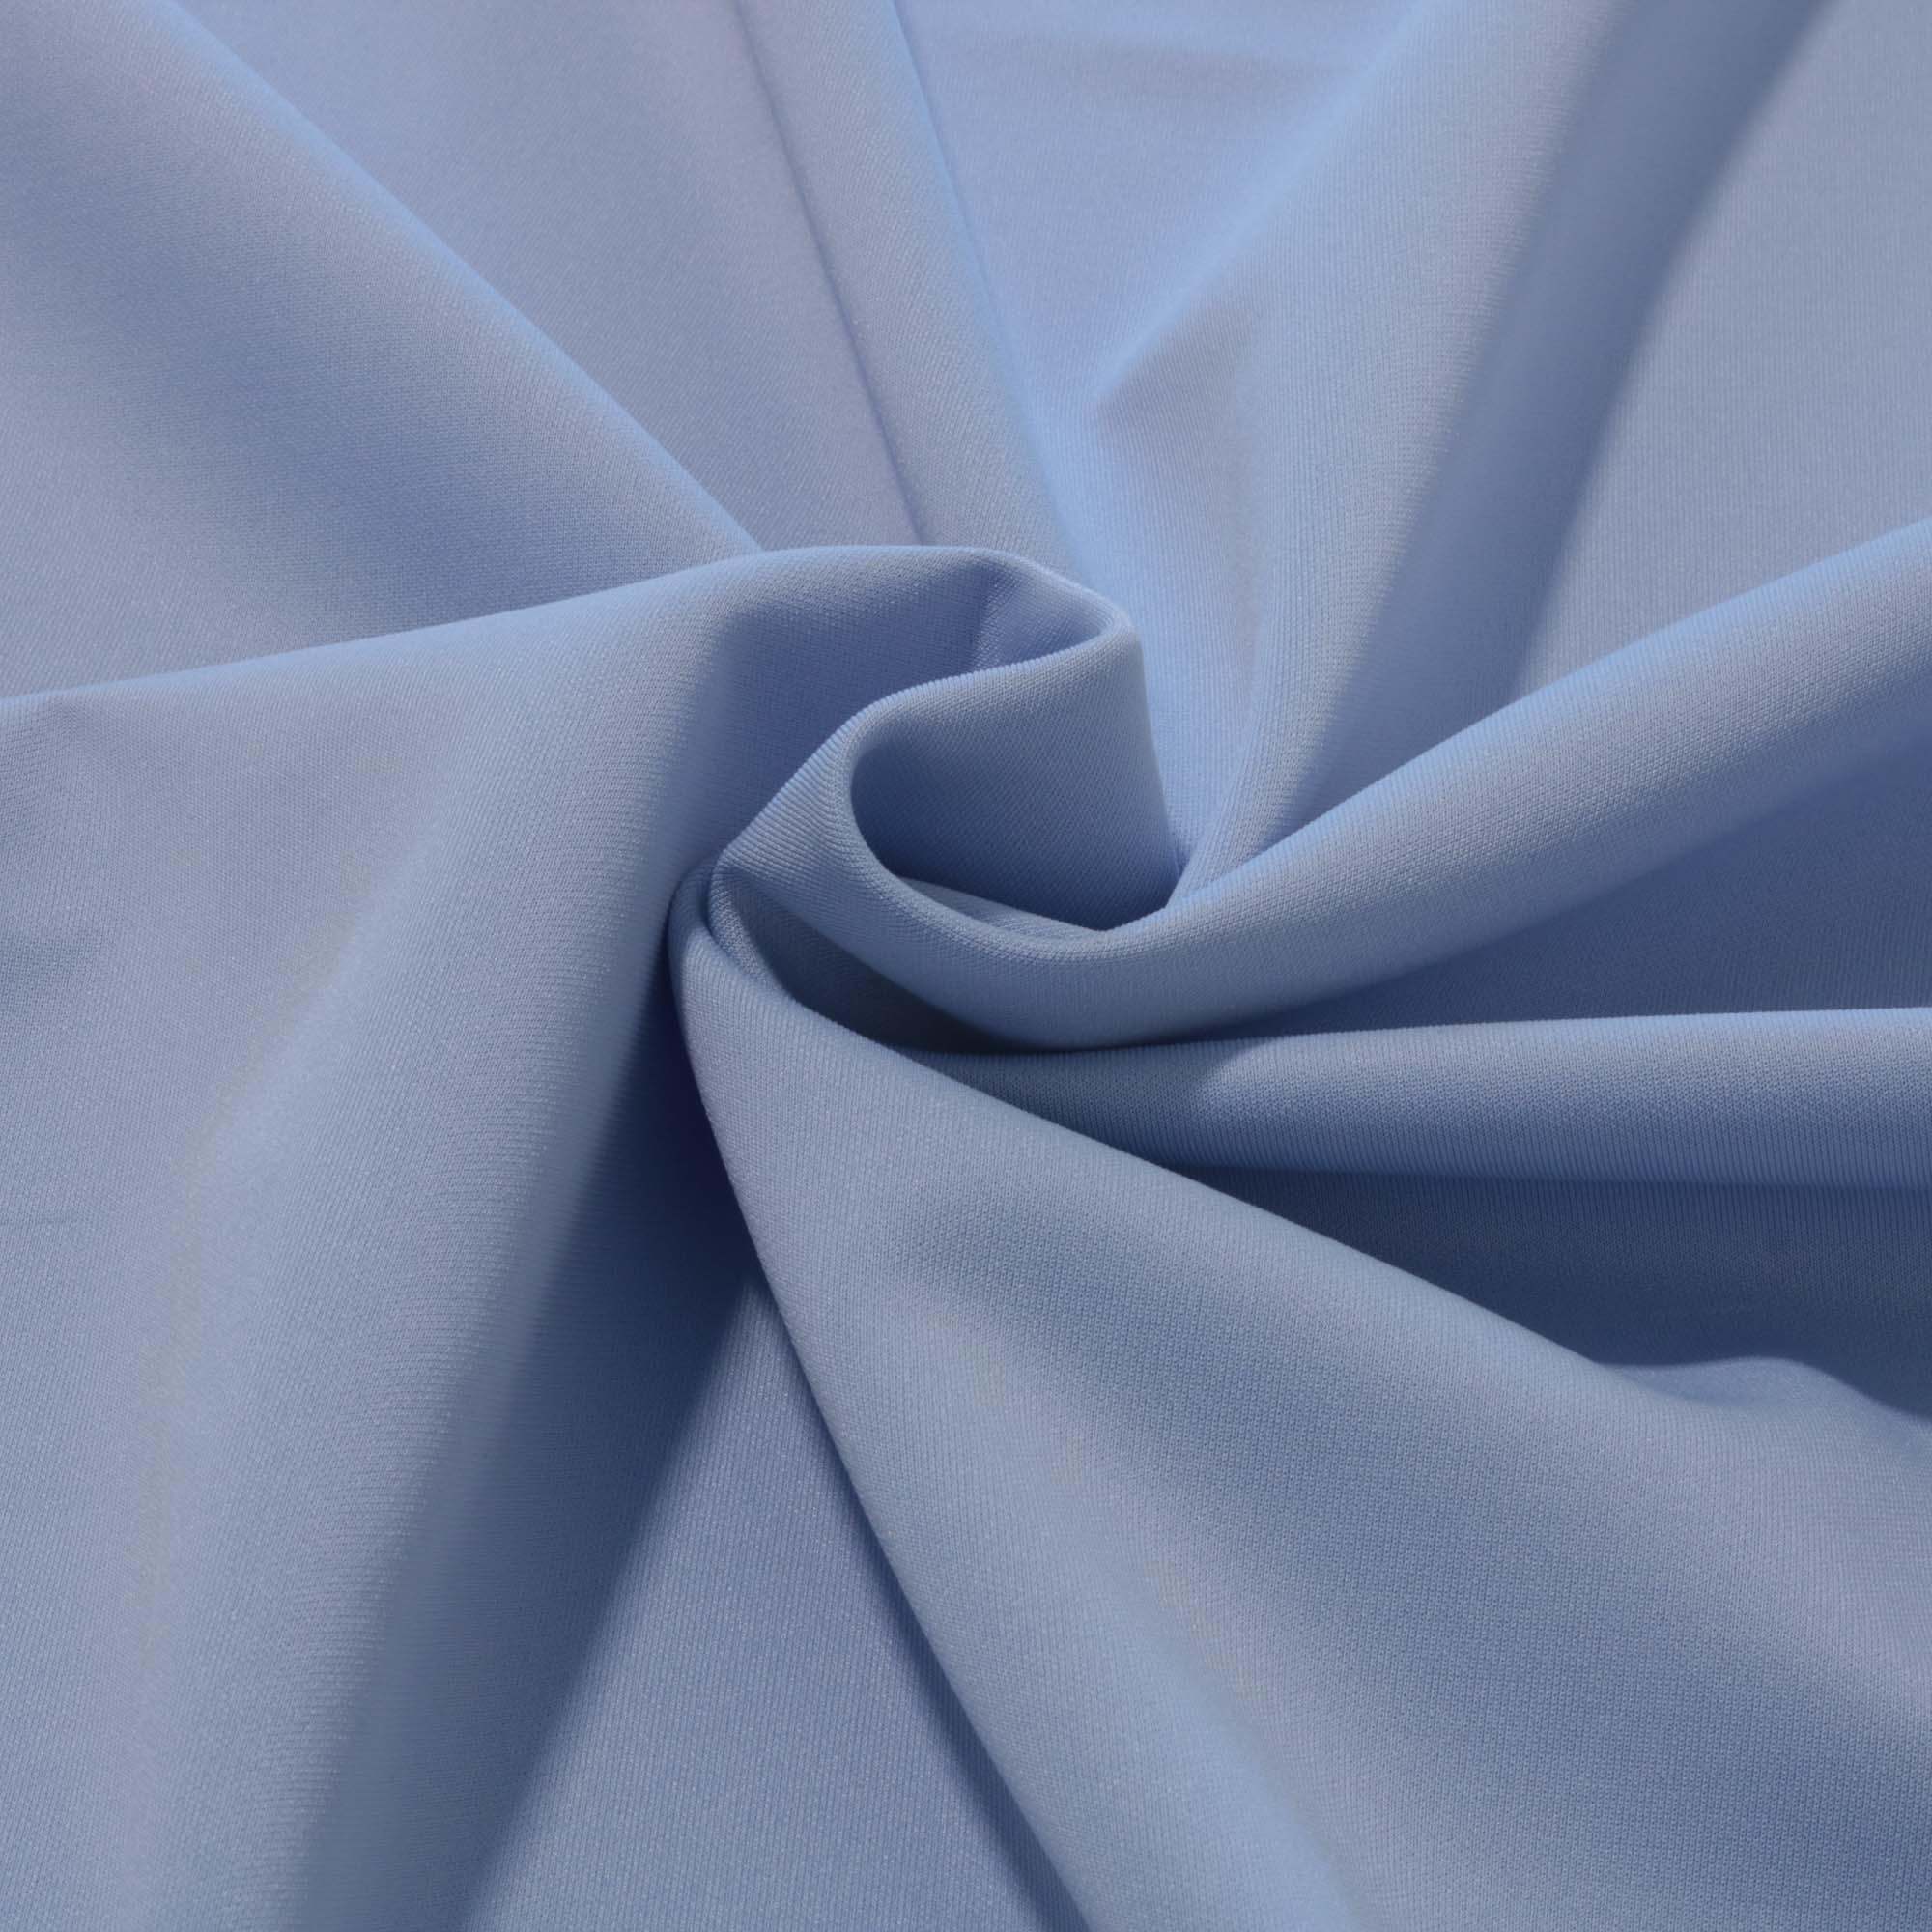 Tecido Malha Neoprene 1,60 m Largura Azul Claro